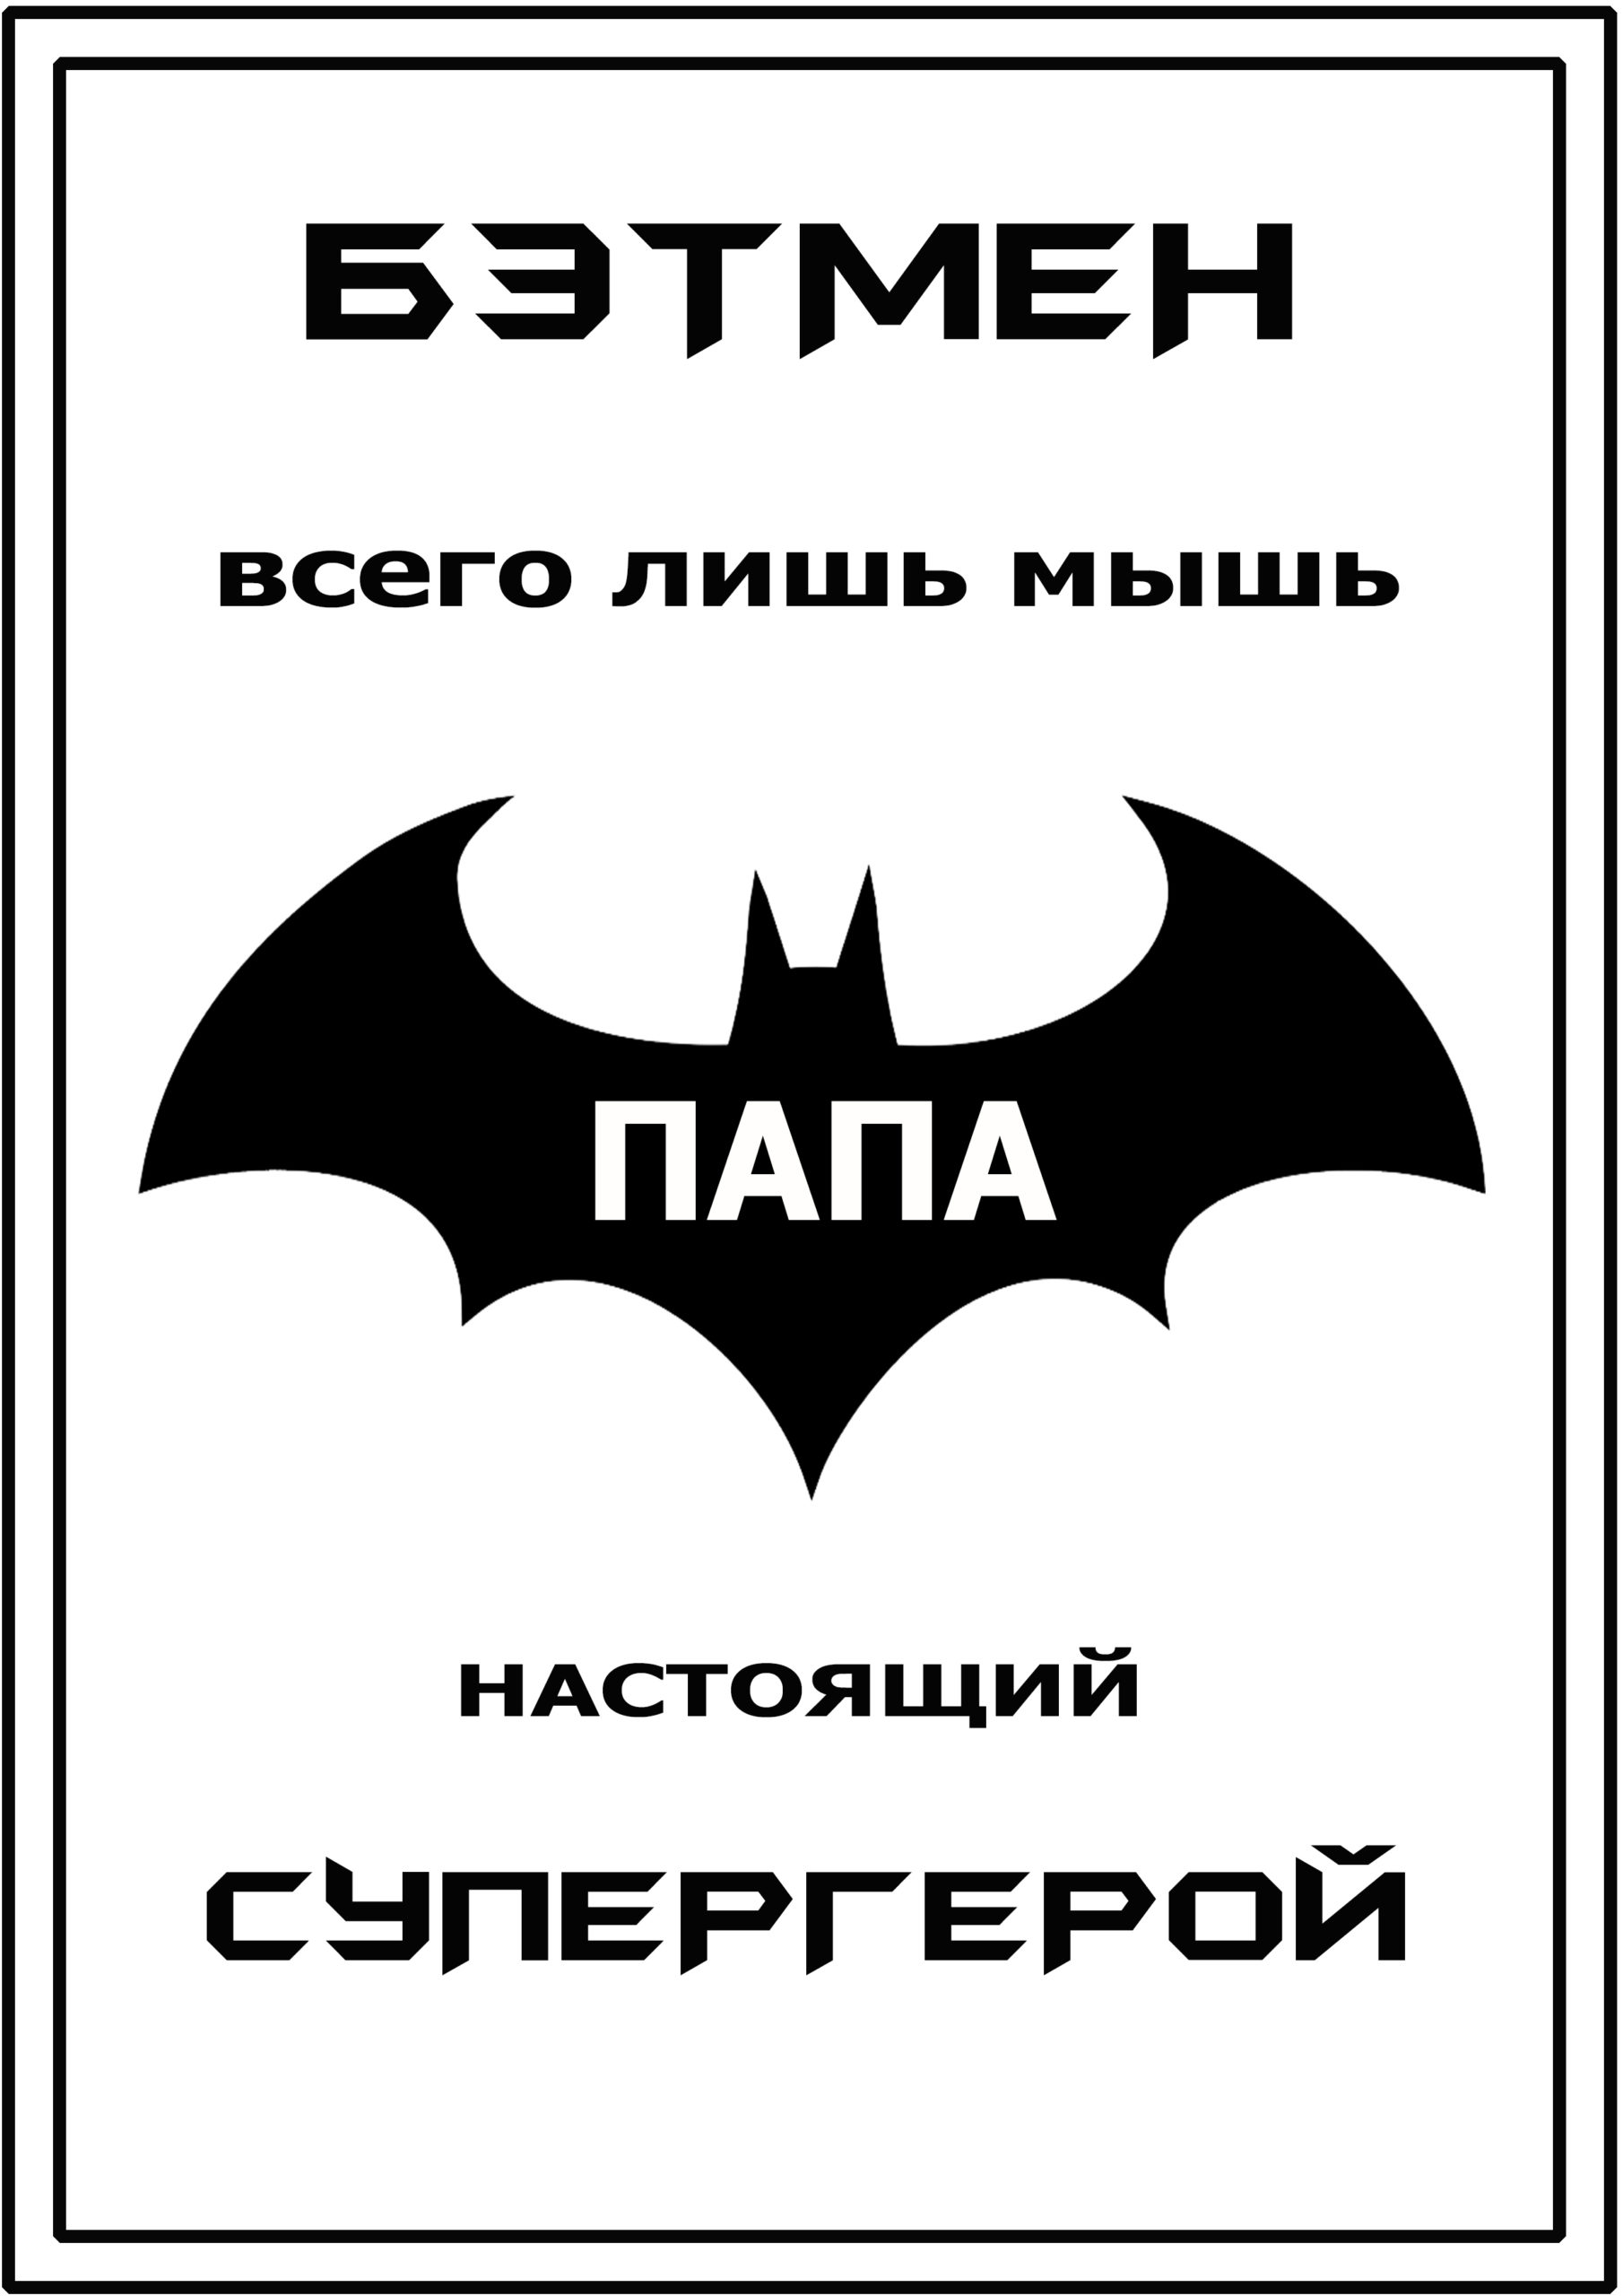 постер к 23 февраля для мужа, постер на 23 февраля, 23 февраля постер папе, постер мужу, постер папе, бэтмен мышь, постер 23 февраля шаблон, постер 23 февраля бесплатно, постер мужской, постер мужчине